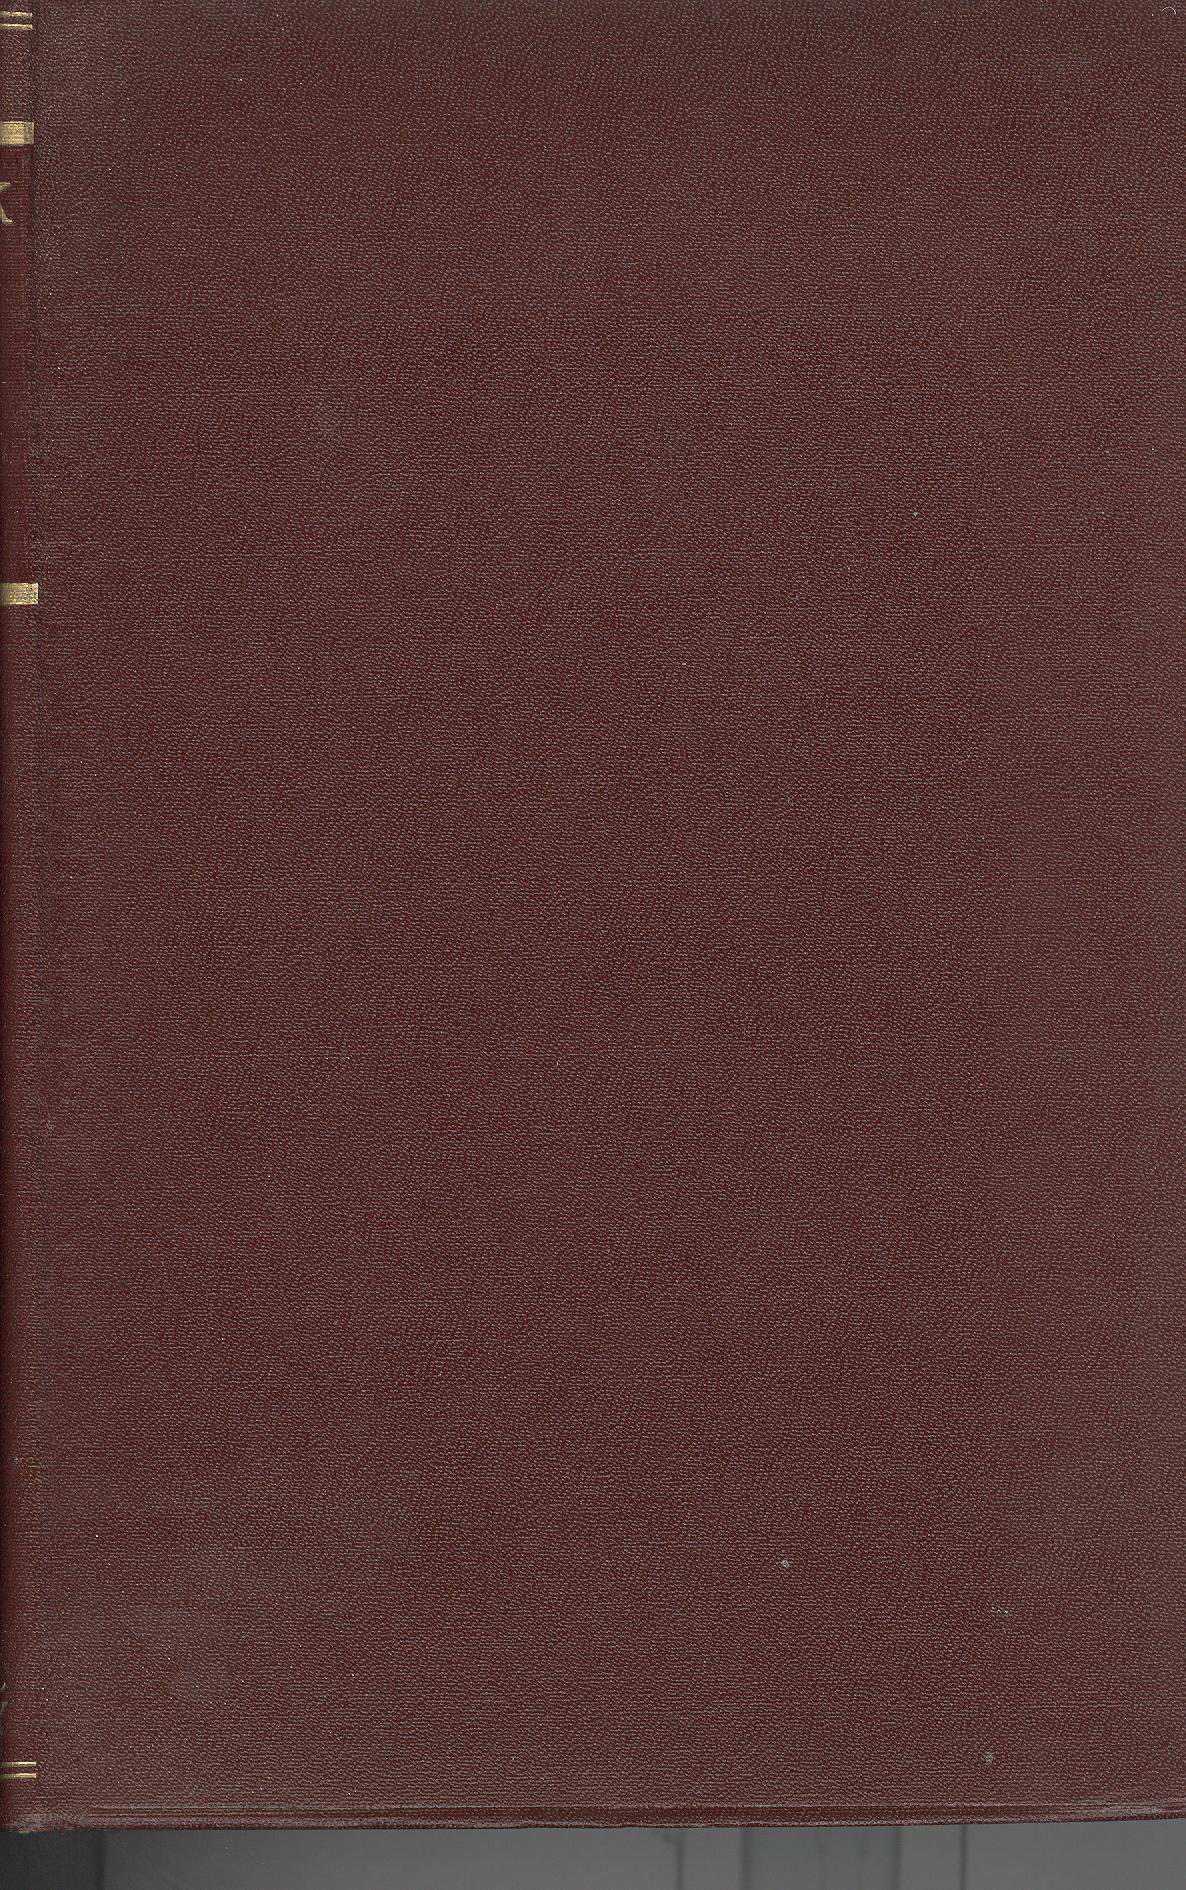 Handbook of Noise Control